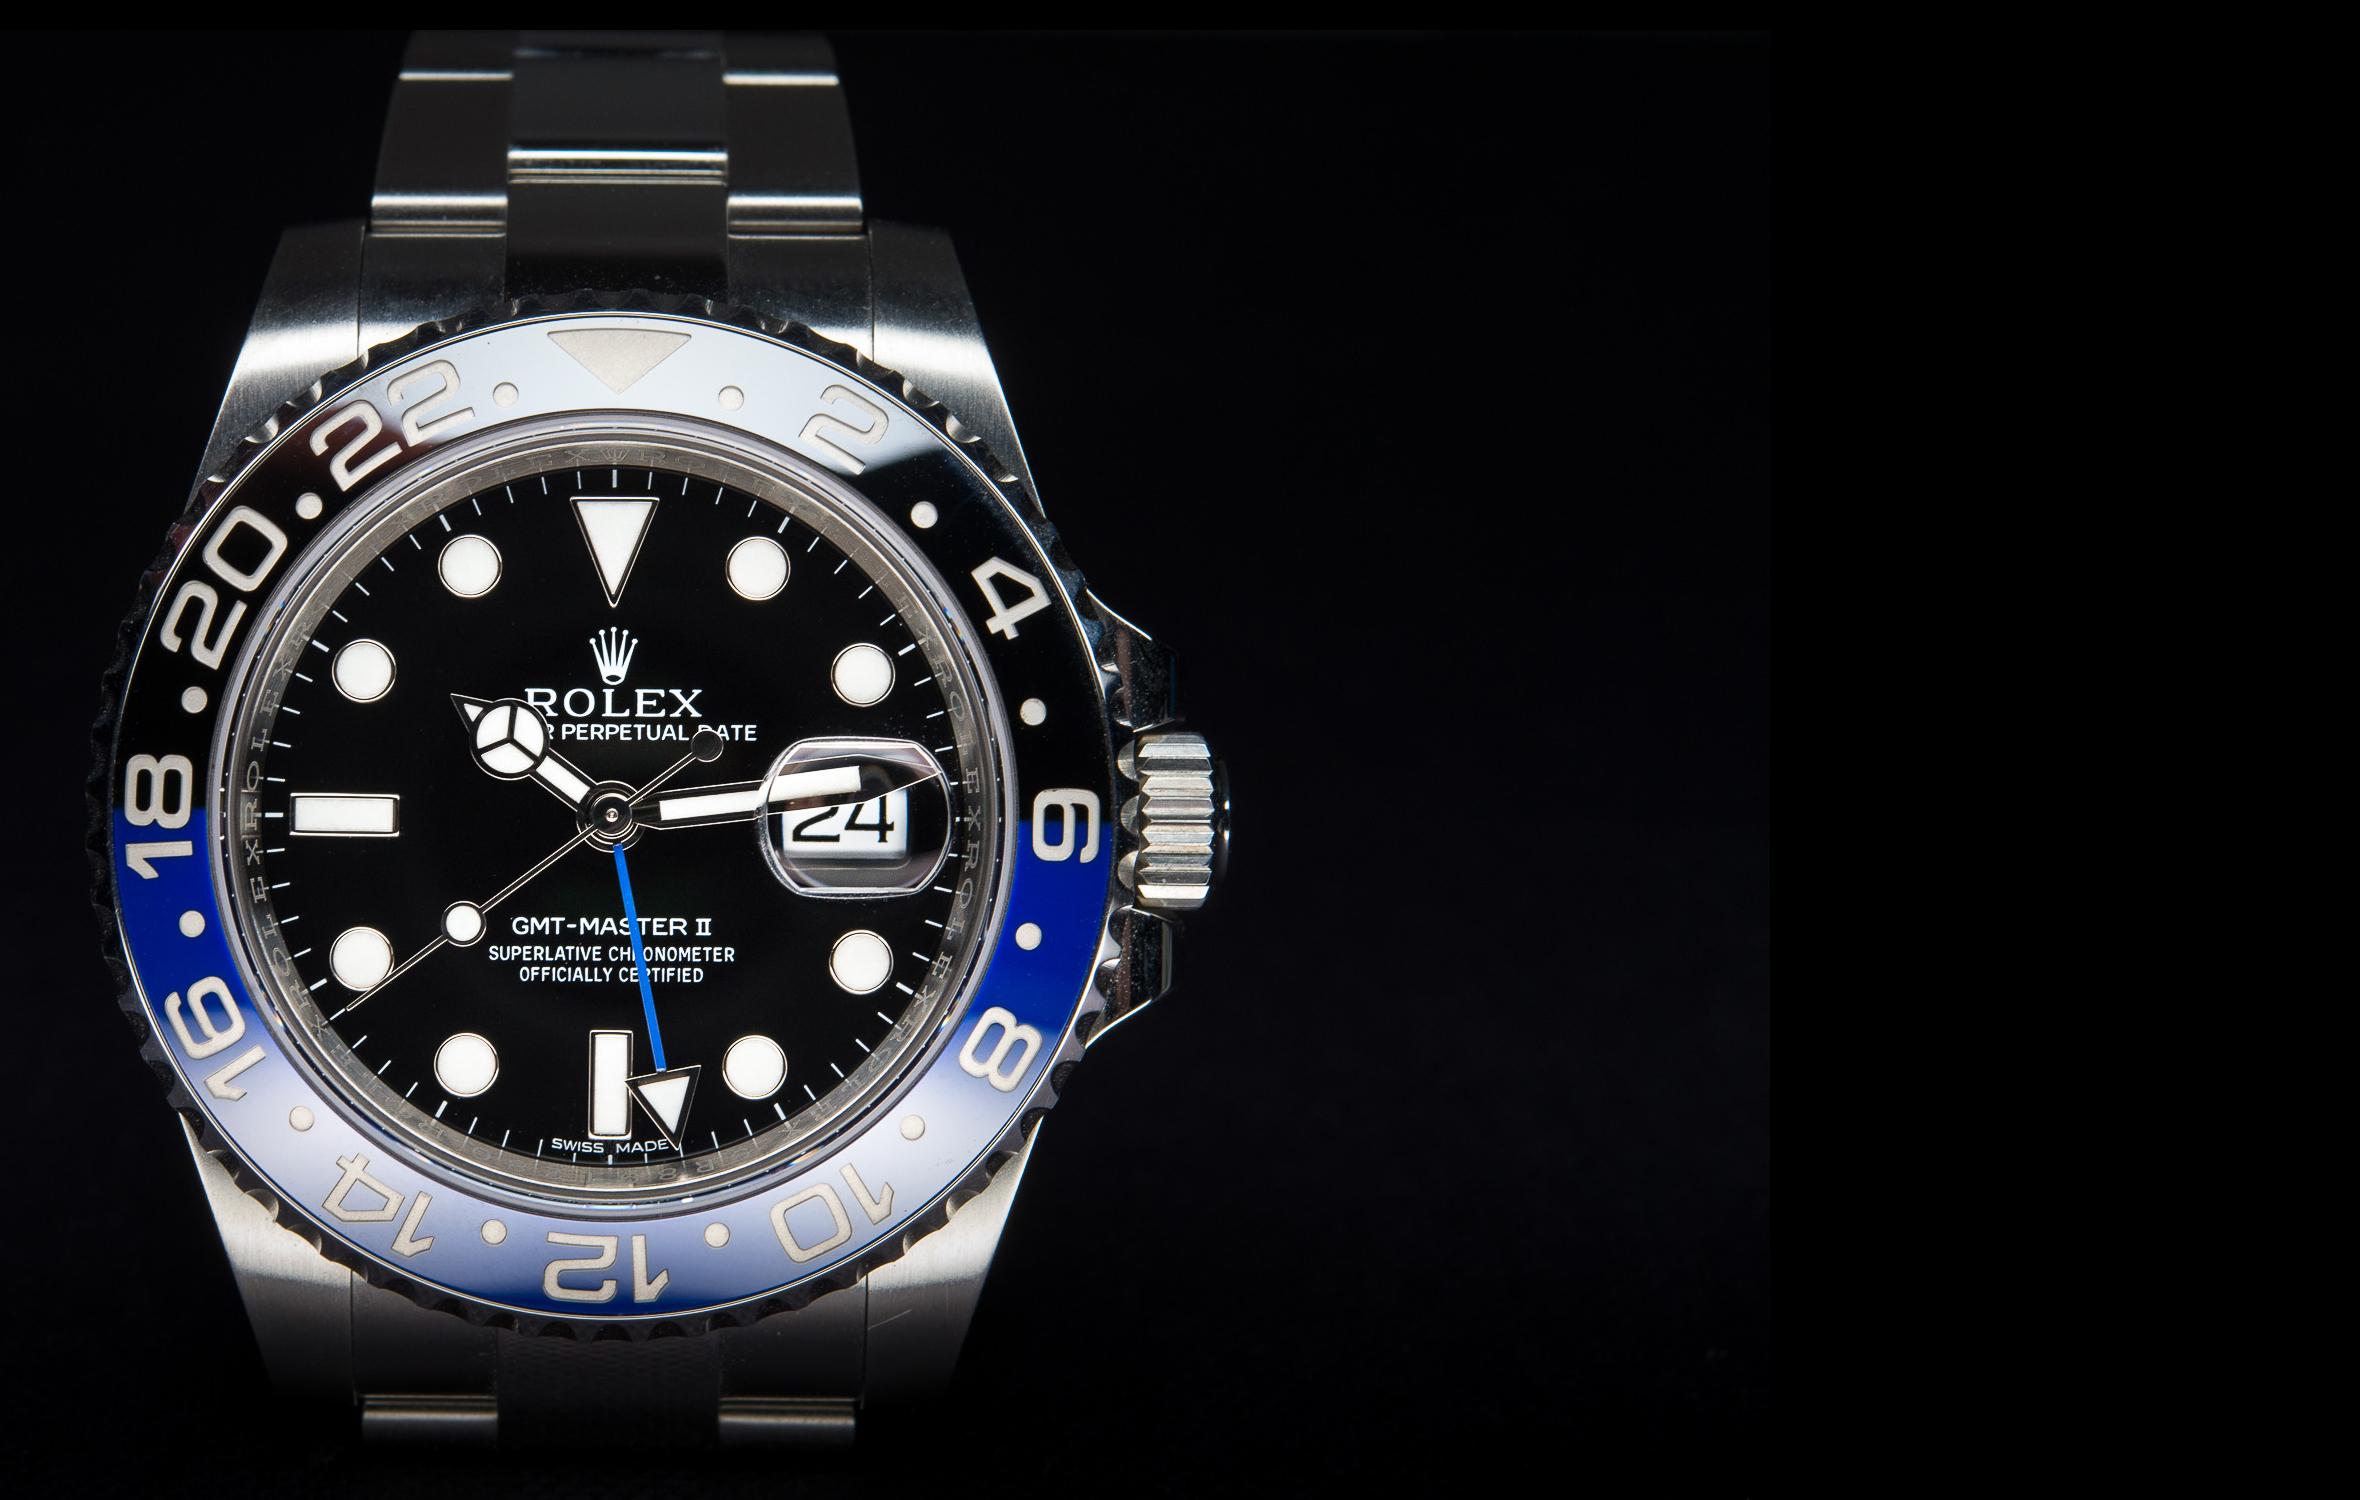 Rolex Gmt Master Ii Blnr For Sale